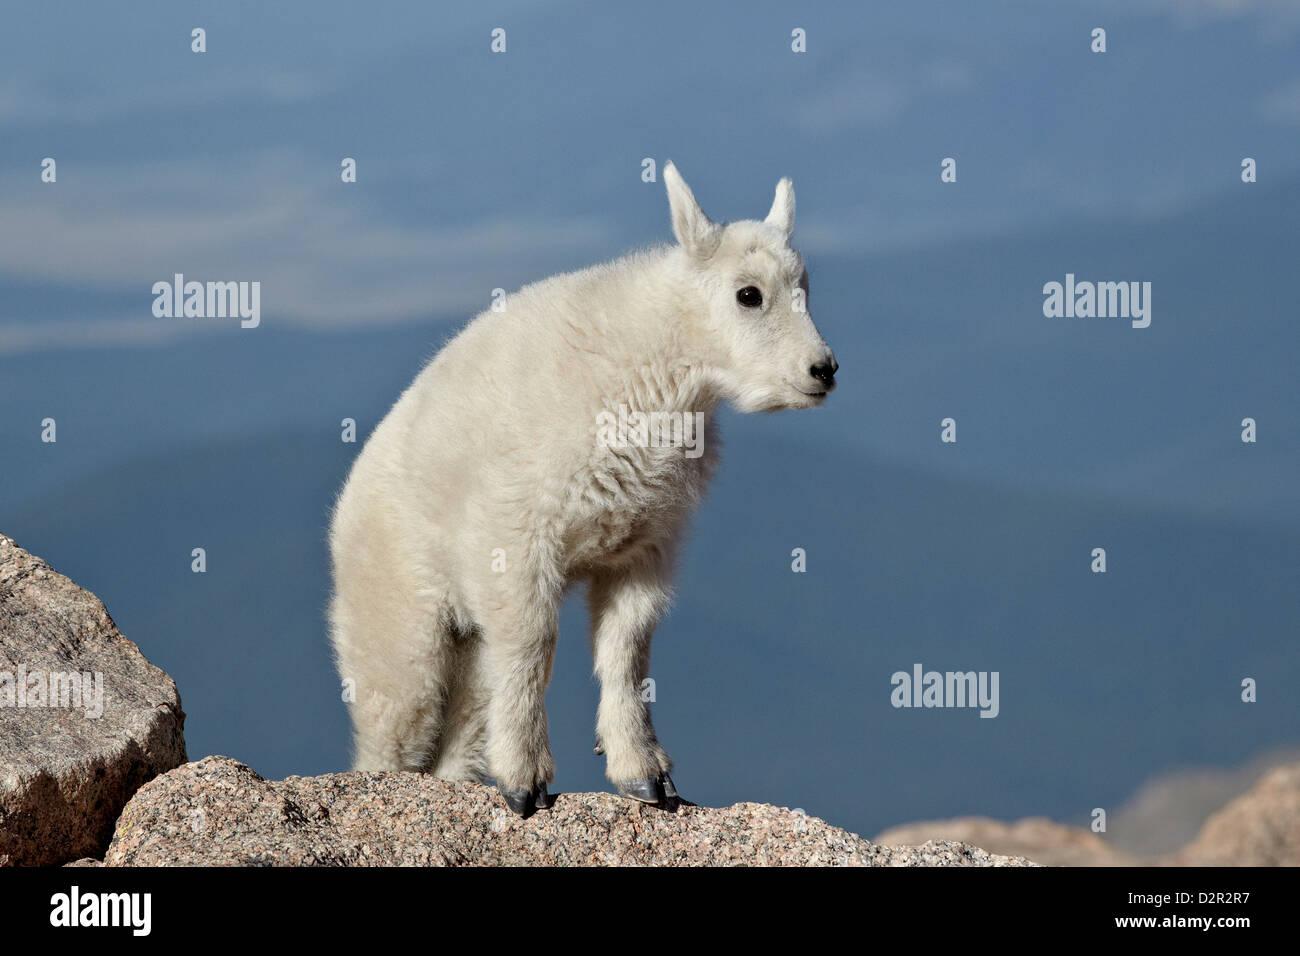 Mountain goat (Oreamnos americanus) kid, Mount Evans, Arapaho-Roosevelt National Forest, Colorado, USA - Stock Image